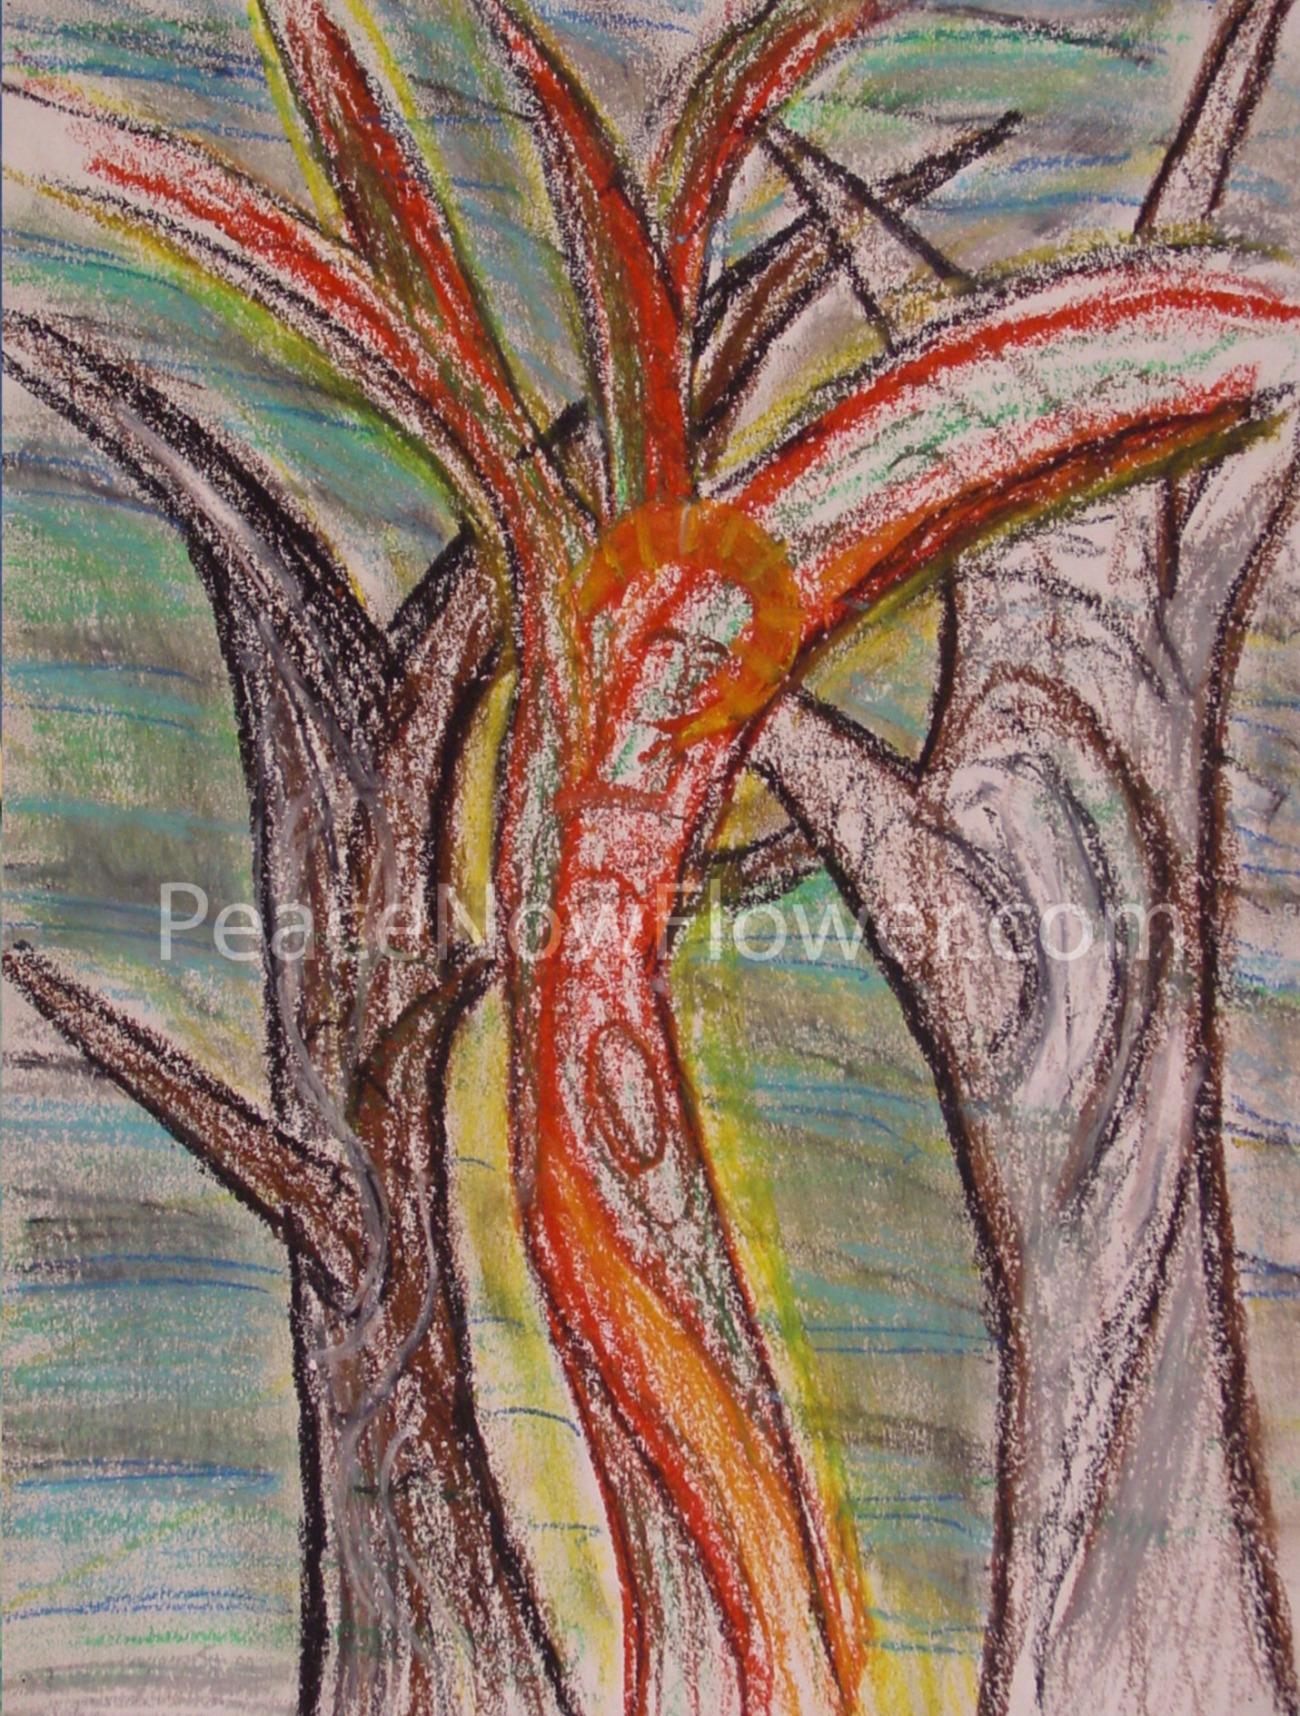 watermark_cross_tree